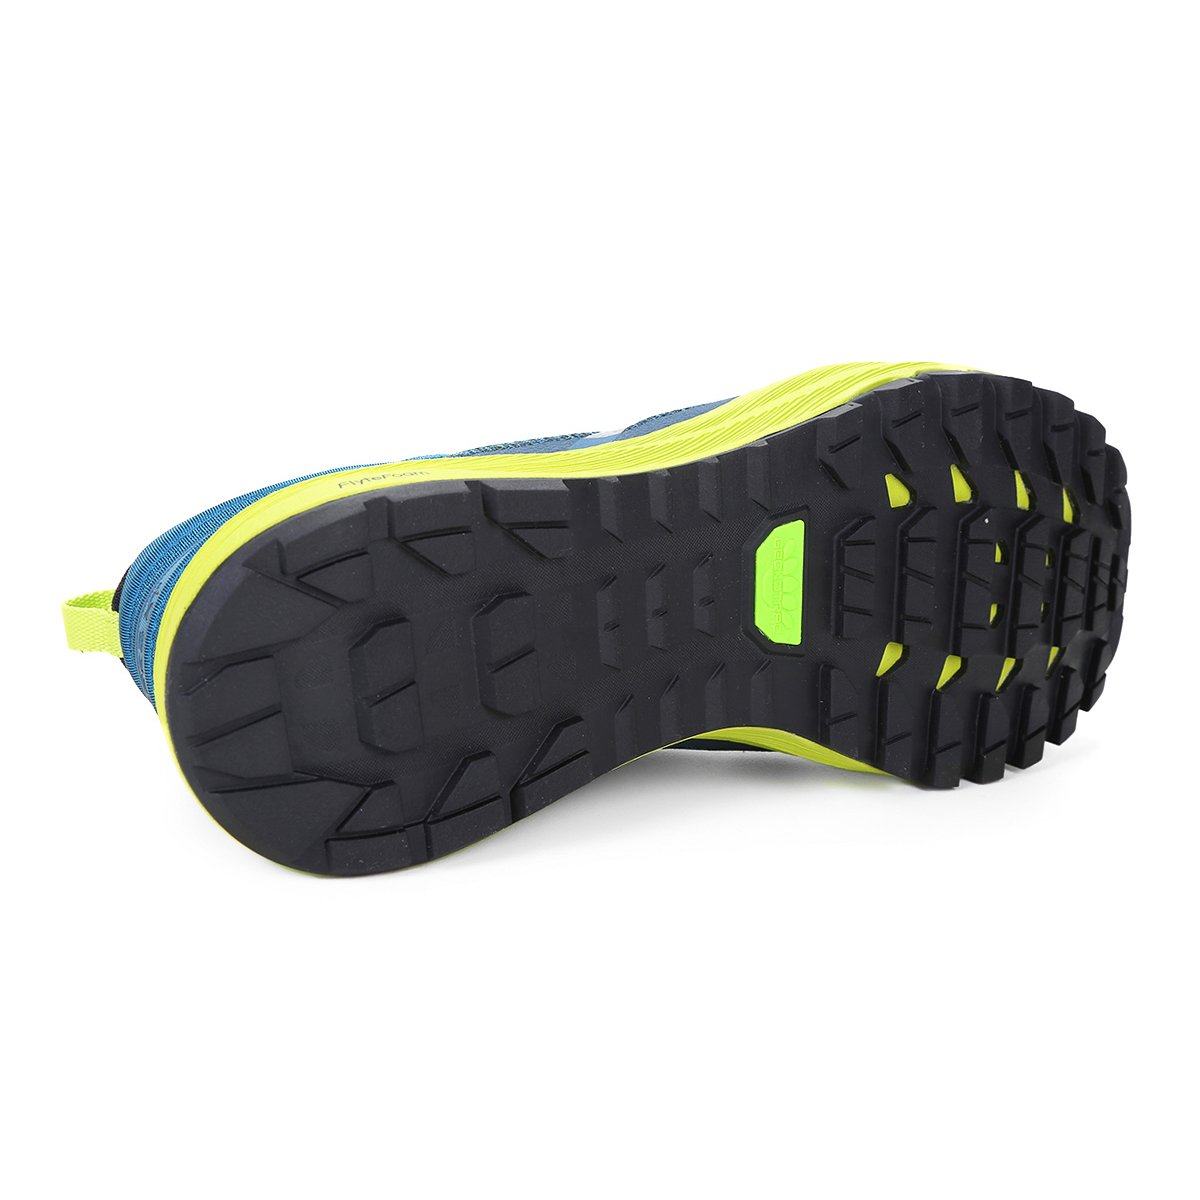 32a6b90d793 Tênis Asics Gecko XT Masculino - Compre Agora